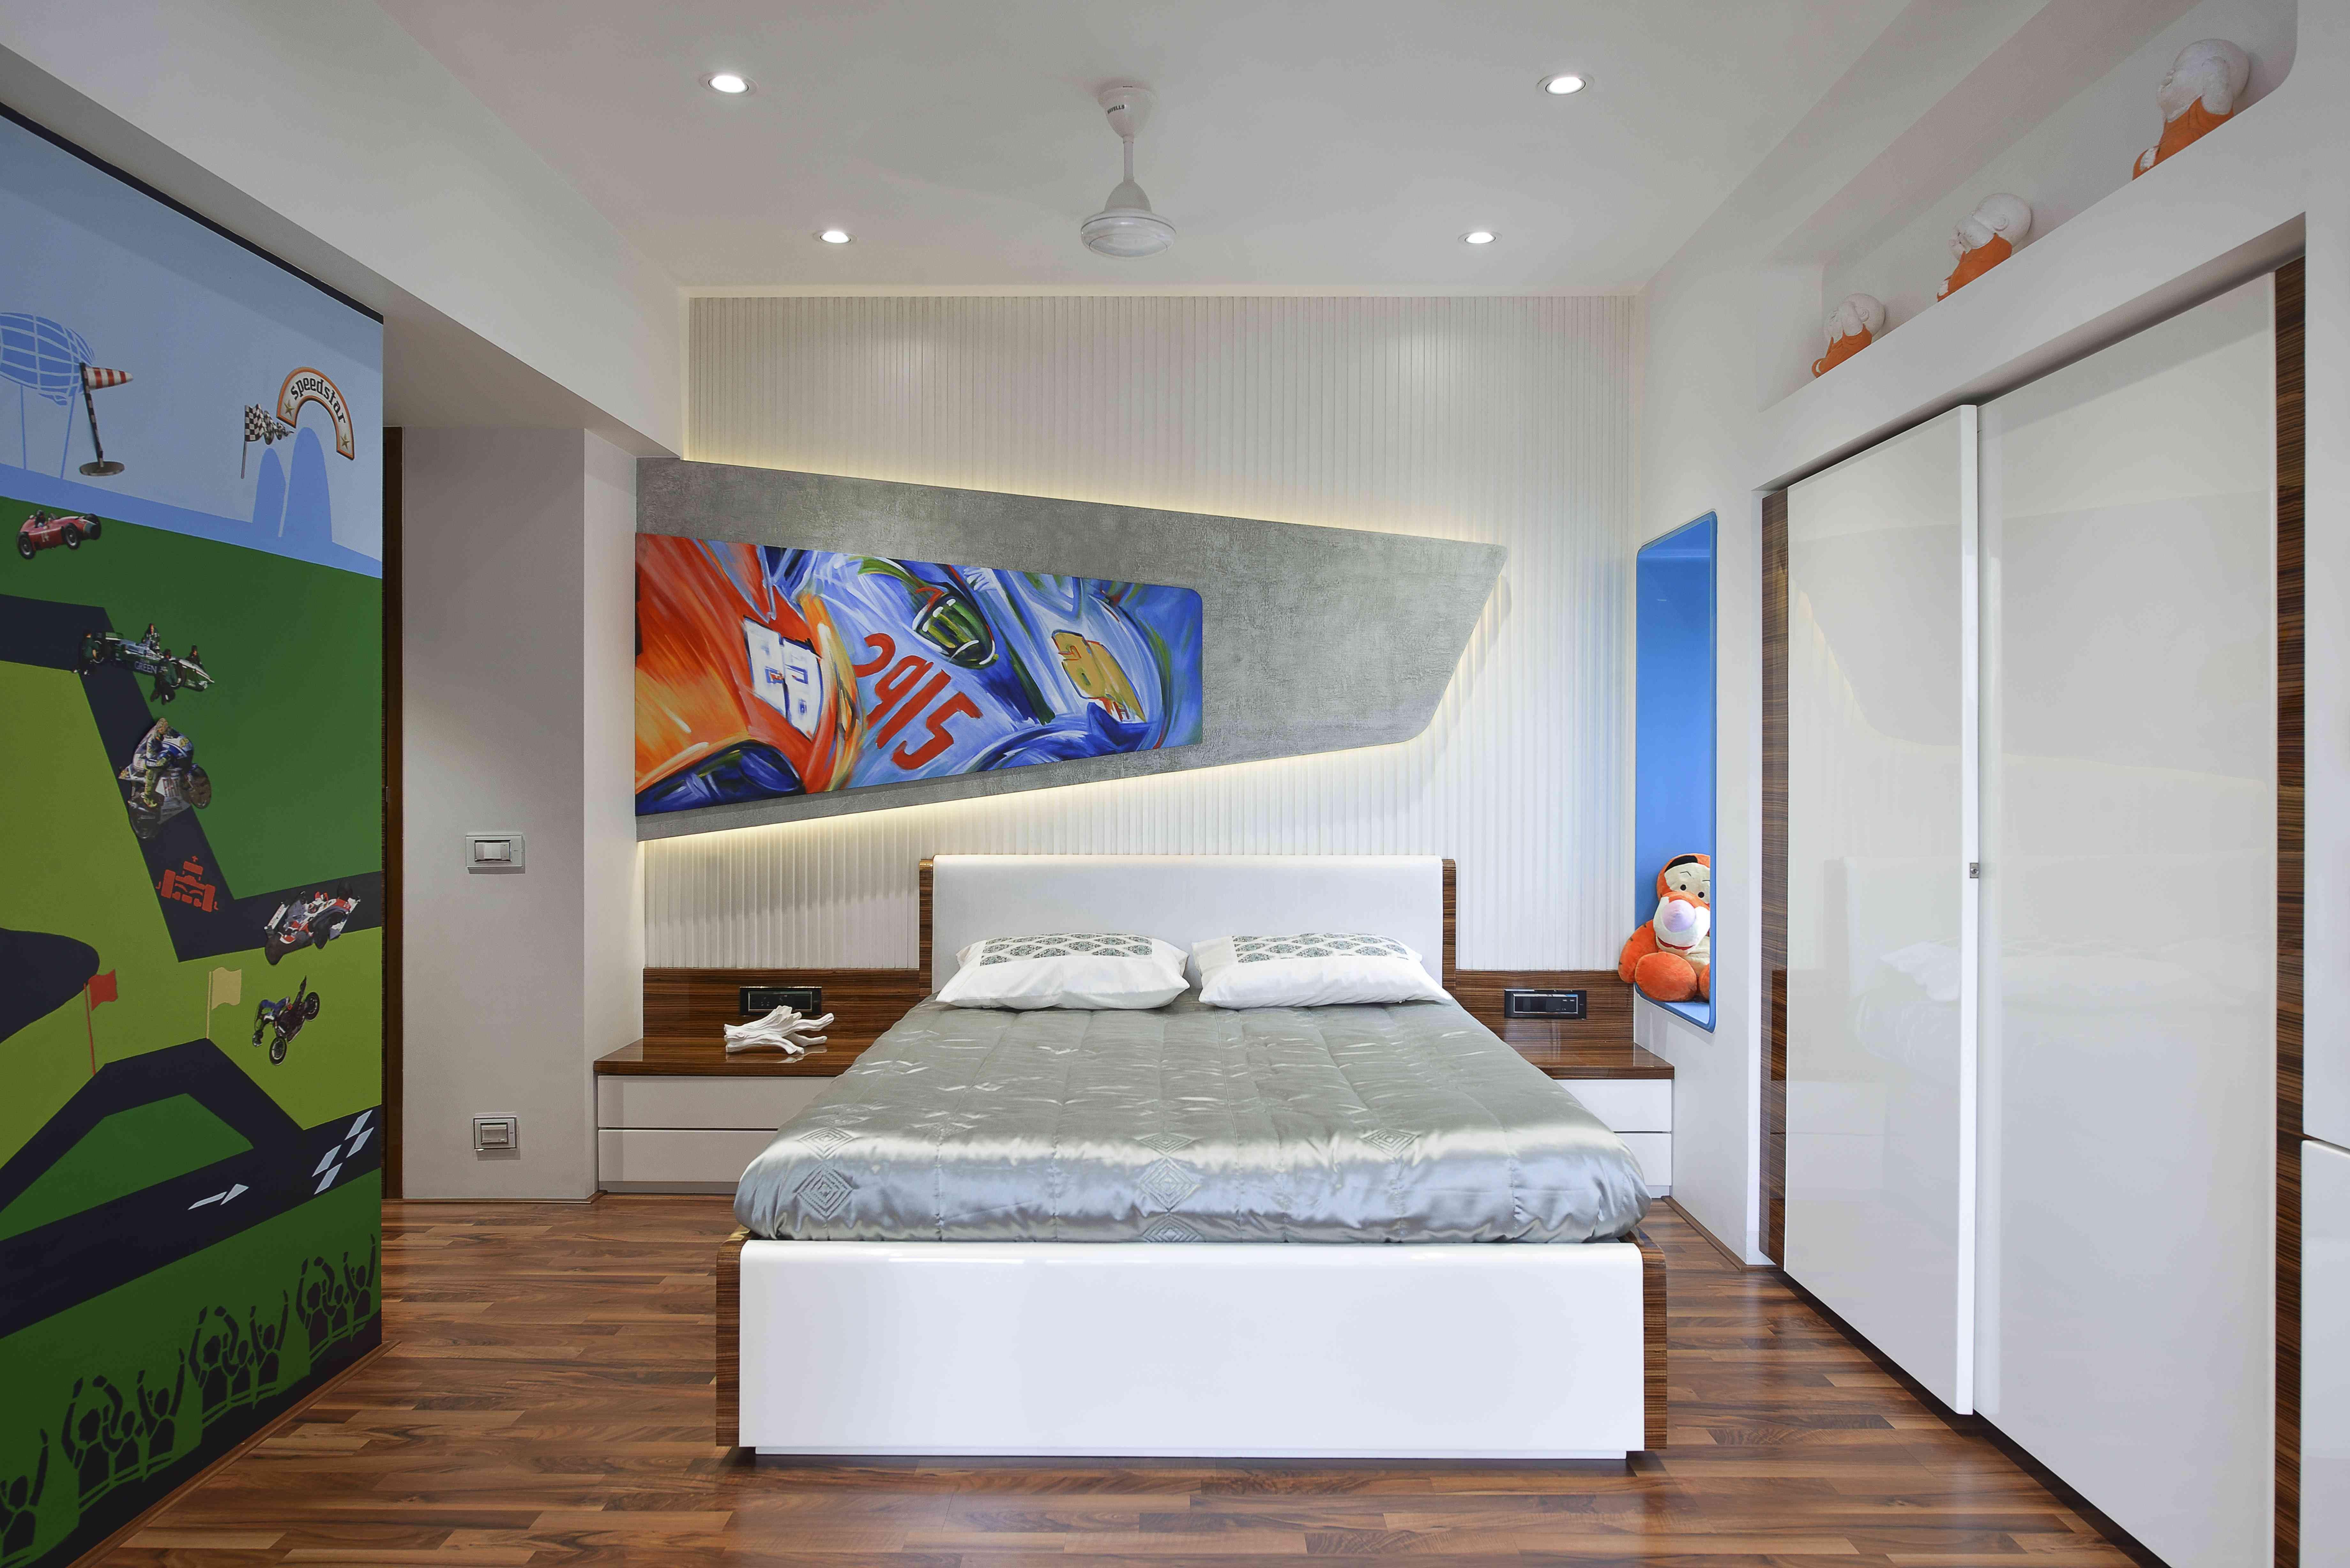 5 room hdb master bedroom design  Small bedroom design  Milind Pai  Beautiful Bedrooms  Pinterest